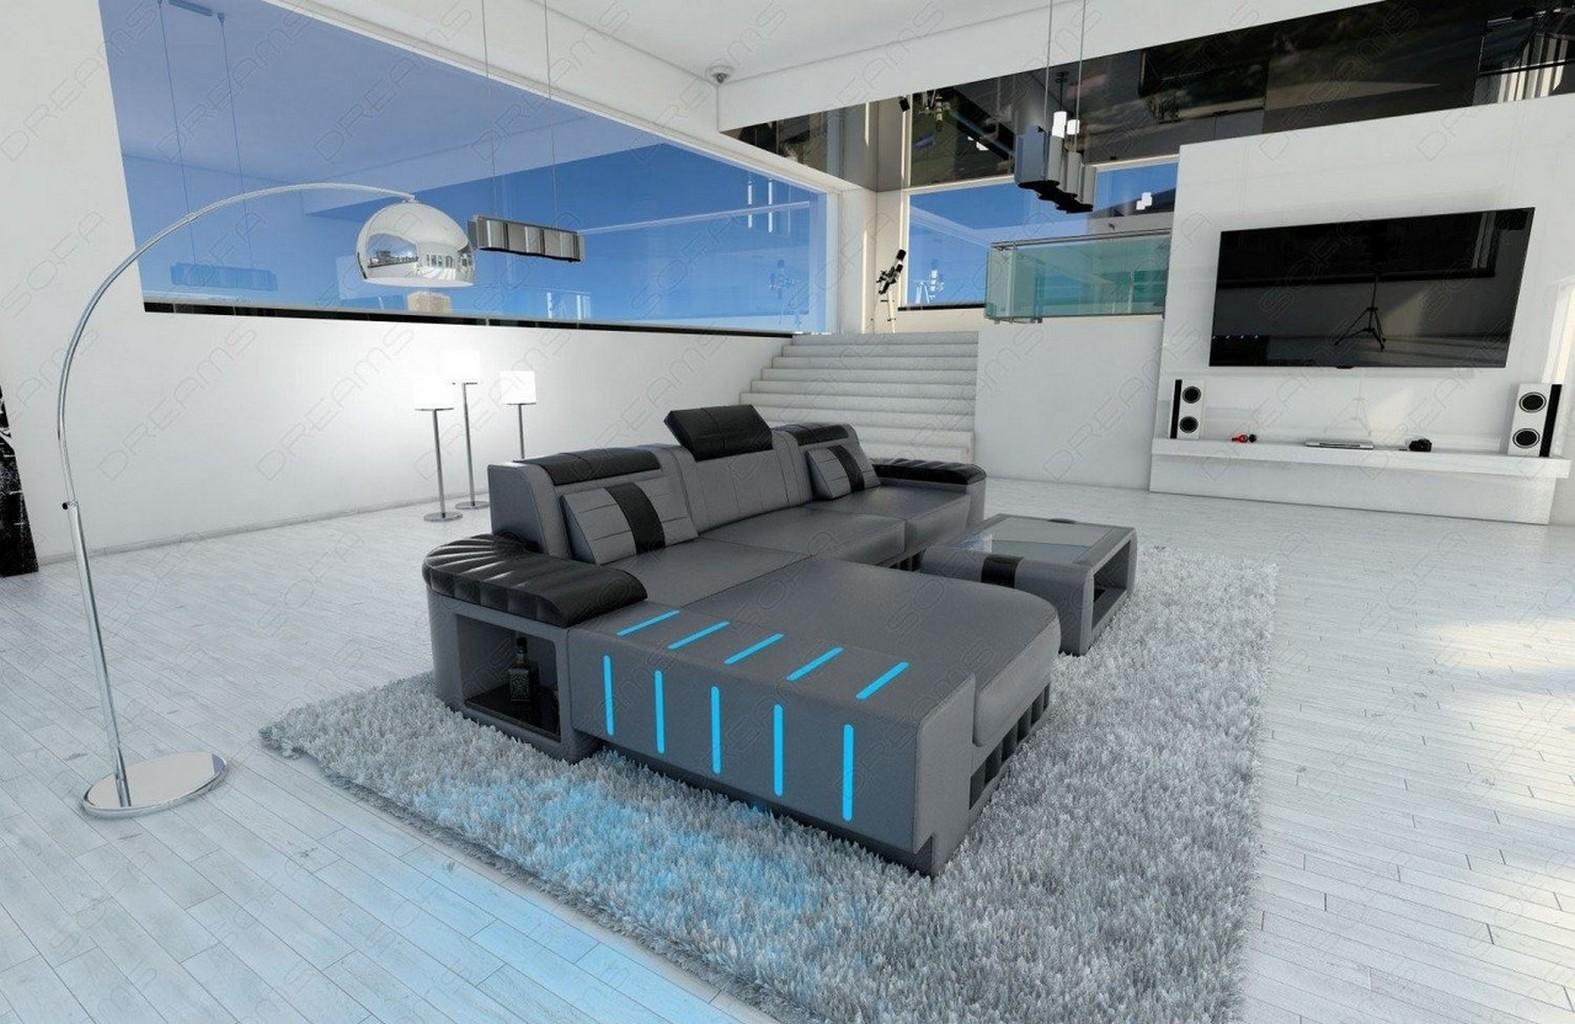 designercouch bellagio l f rmig ecksofa mit led beleuchtung grau schwarz ebay. Black Bedroom Furniture Sets. Home Design Ideas